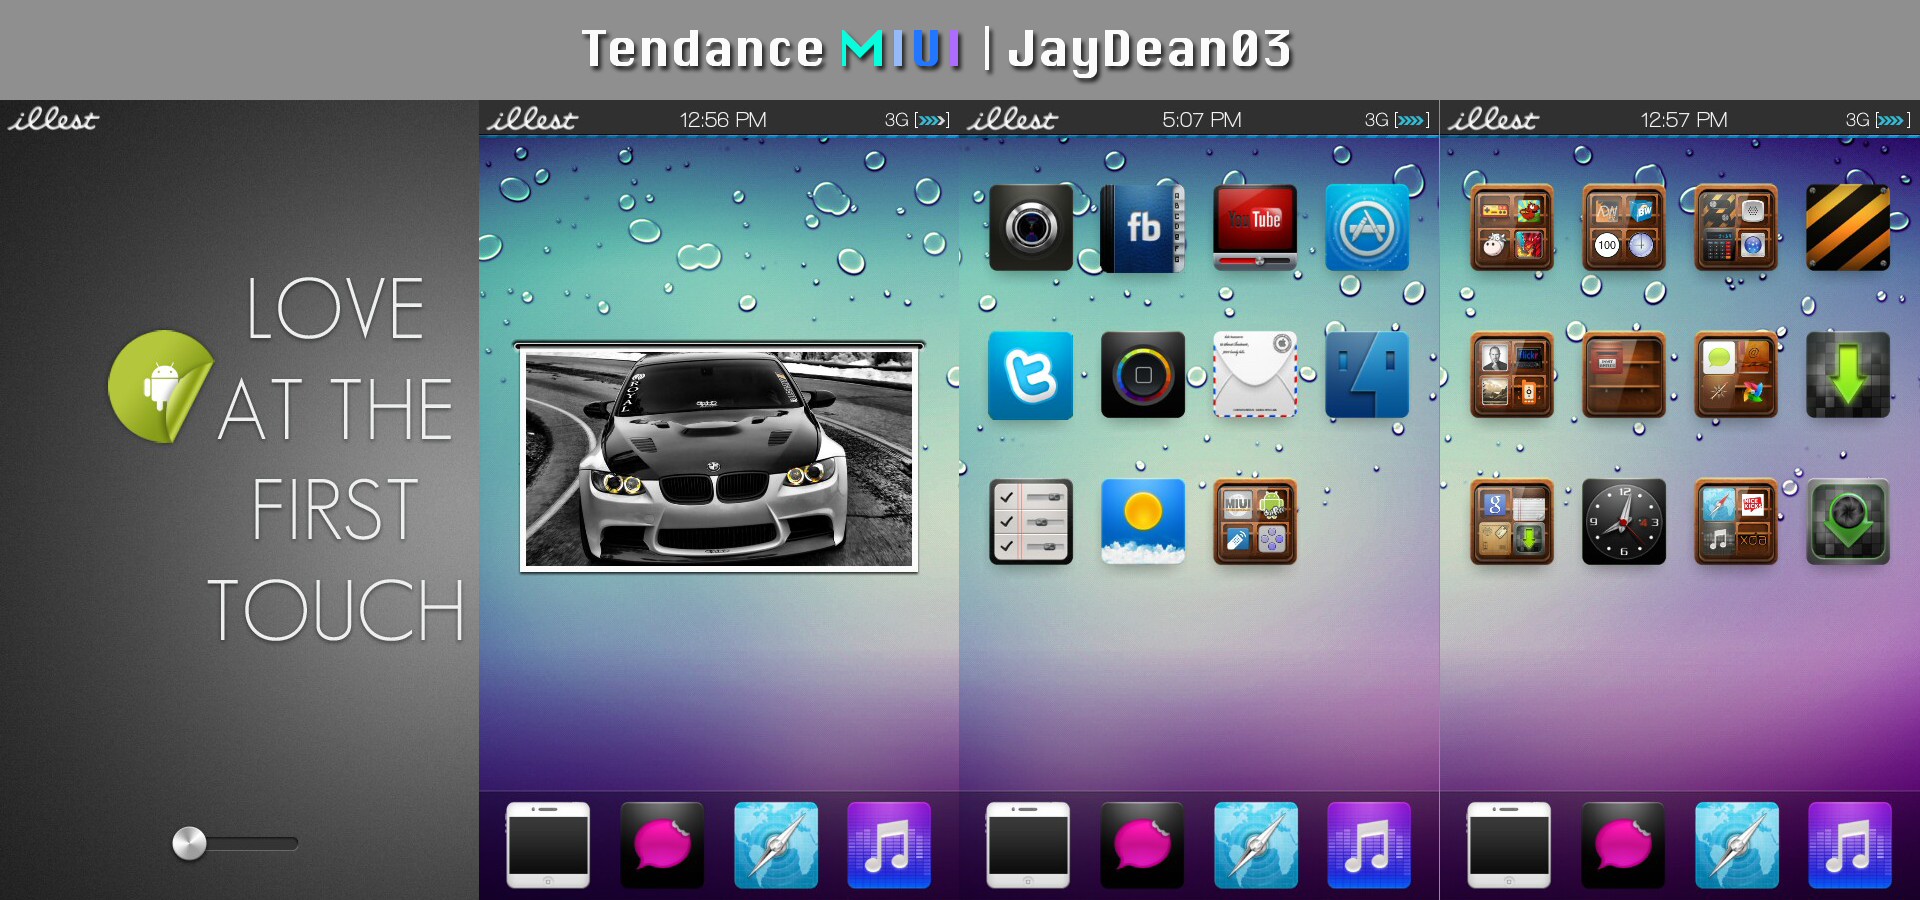 Tendance MIUI by JayDean03